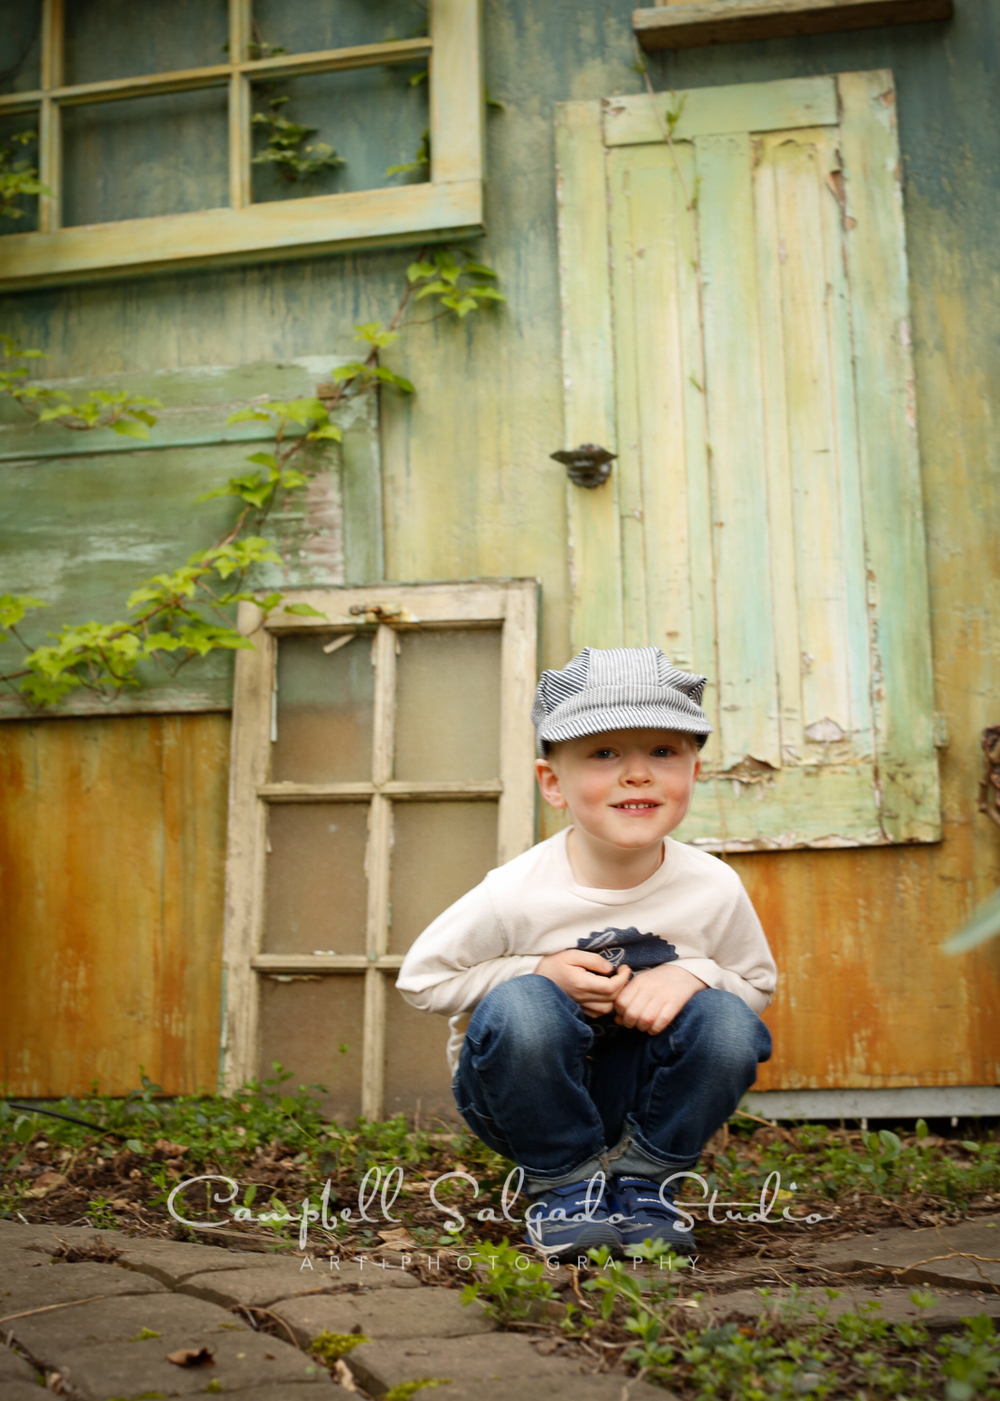 Portrait of child on vintage green doors backgroundby childrens photographers at Campbell Salgado Studio, Portland, Oregon.